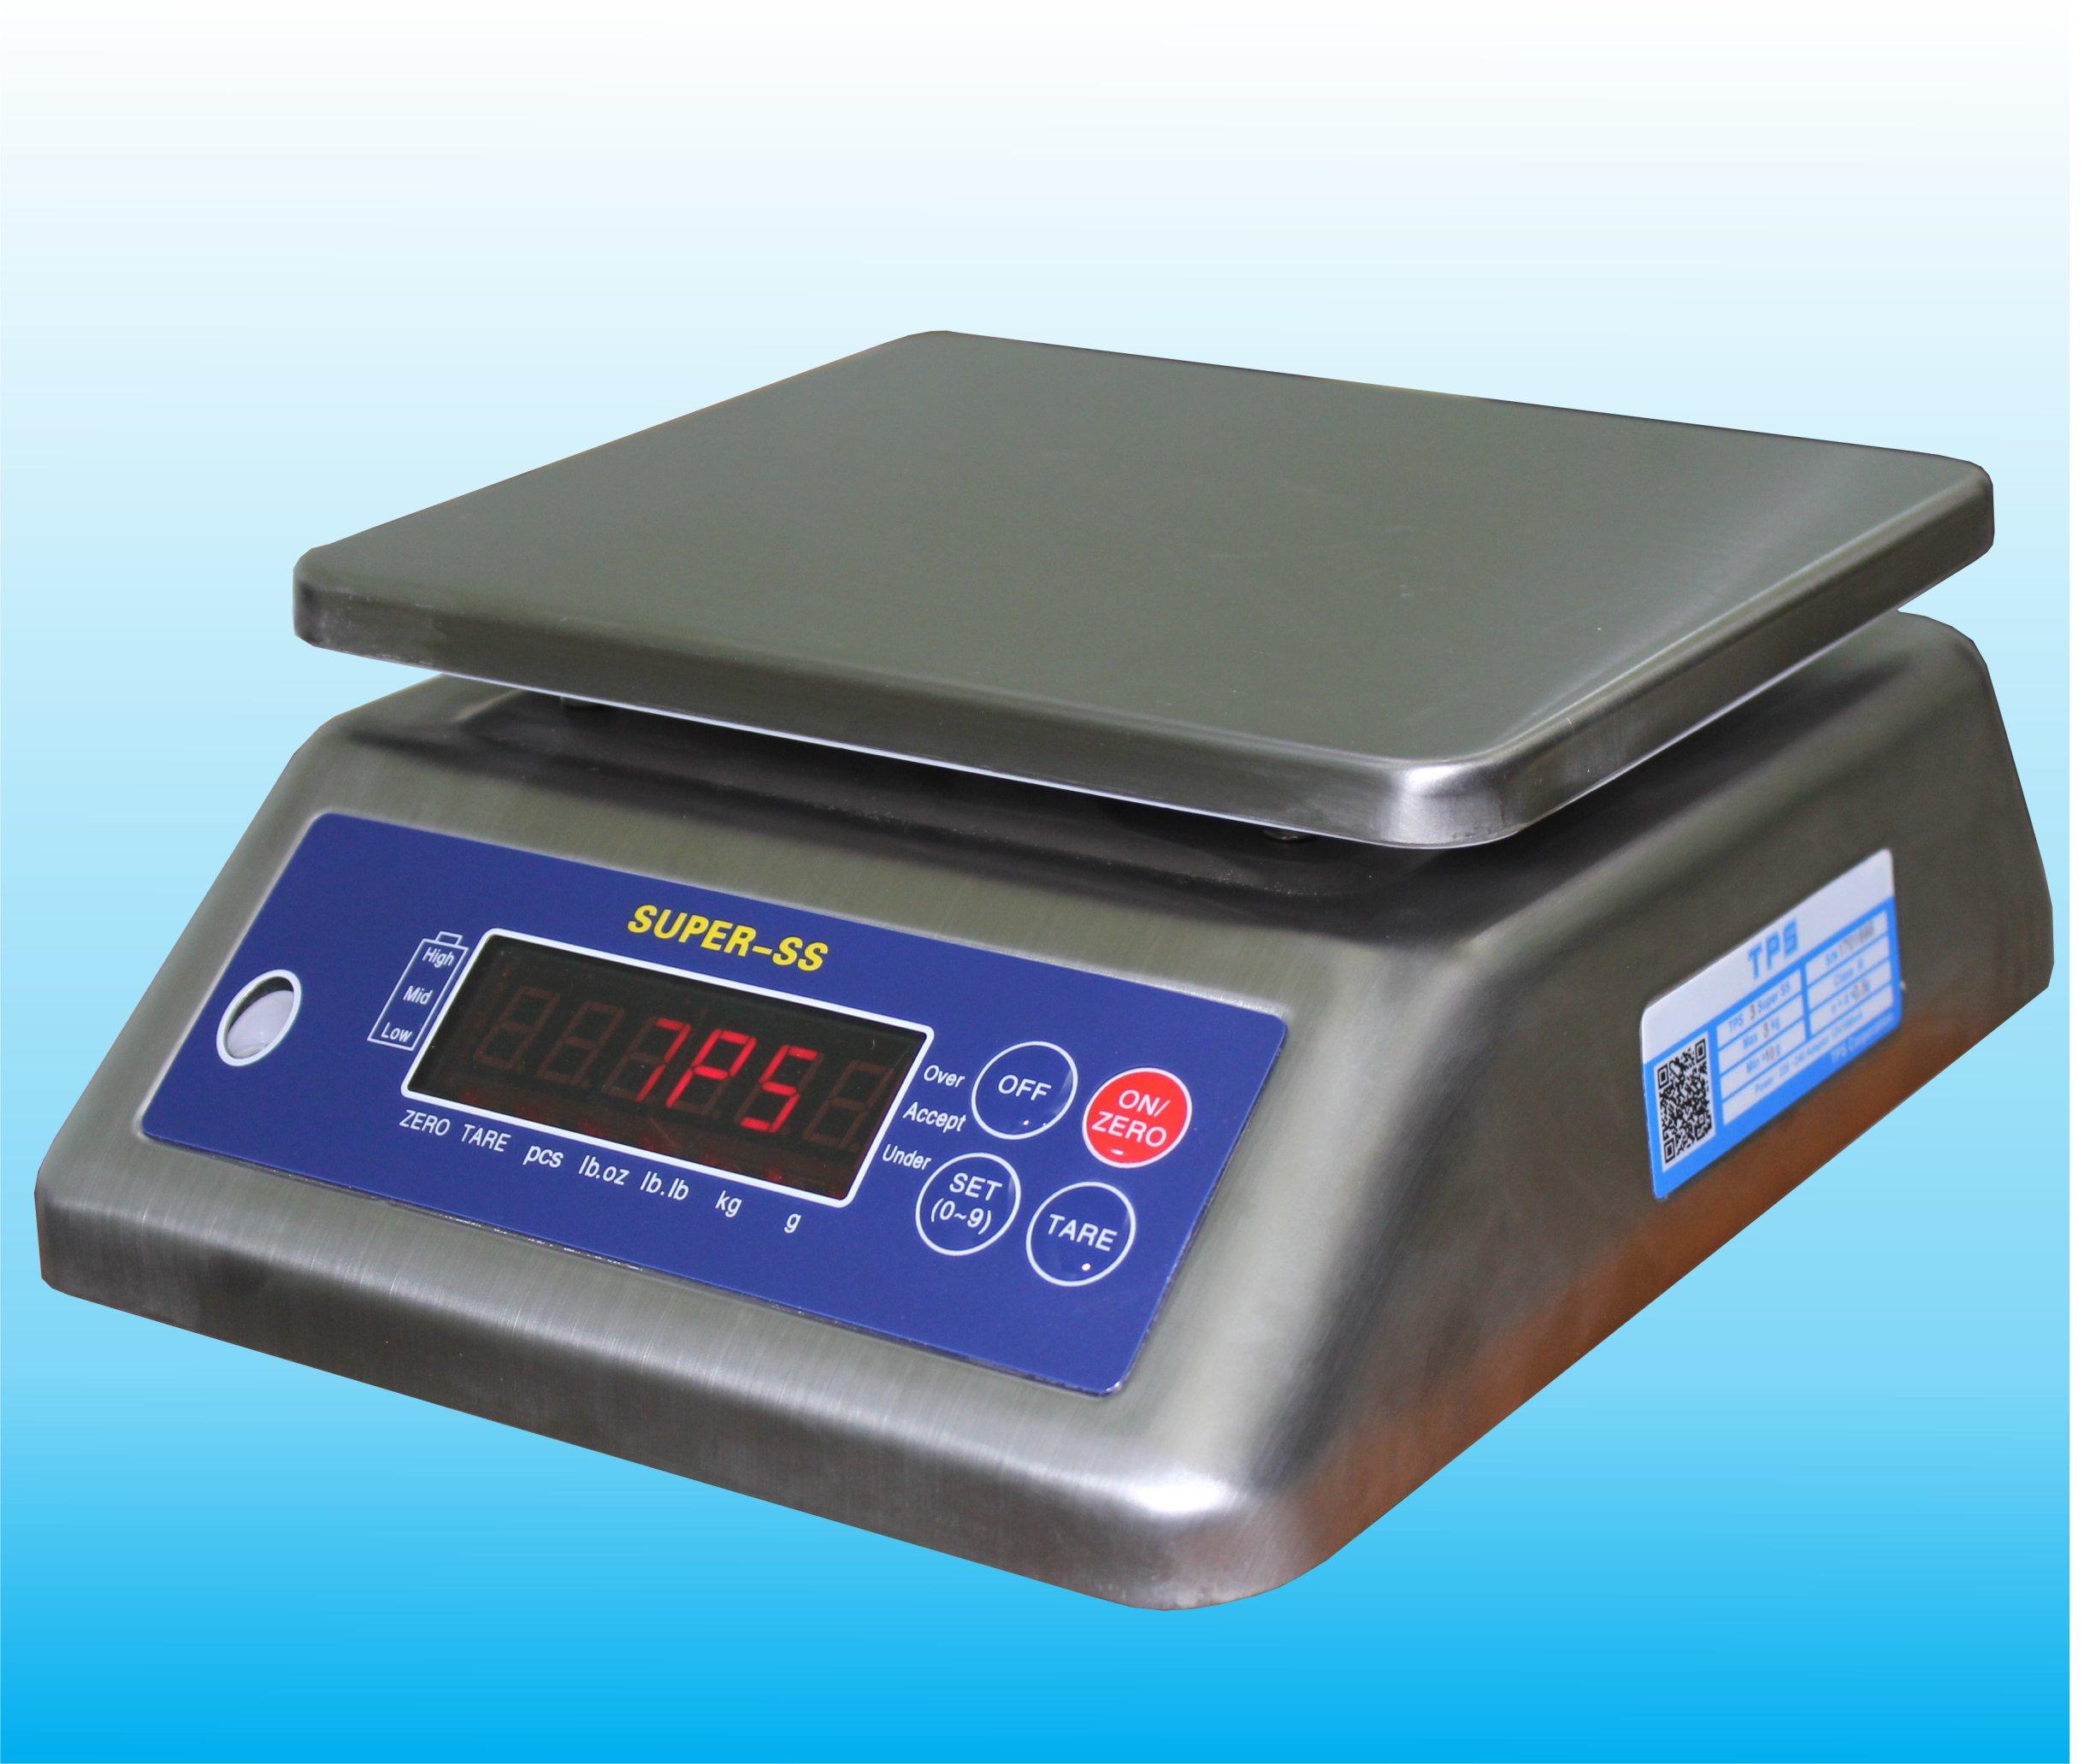 TPS6-SuperSS-6kg/1g - 398